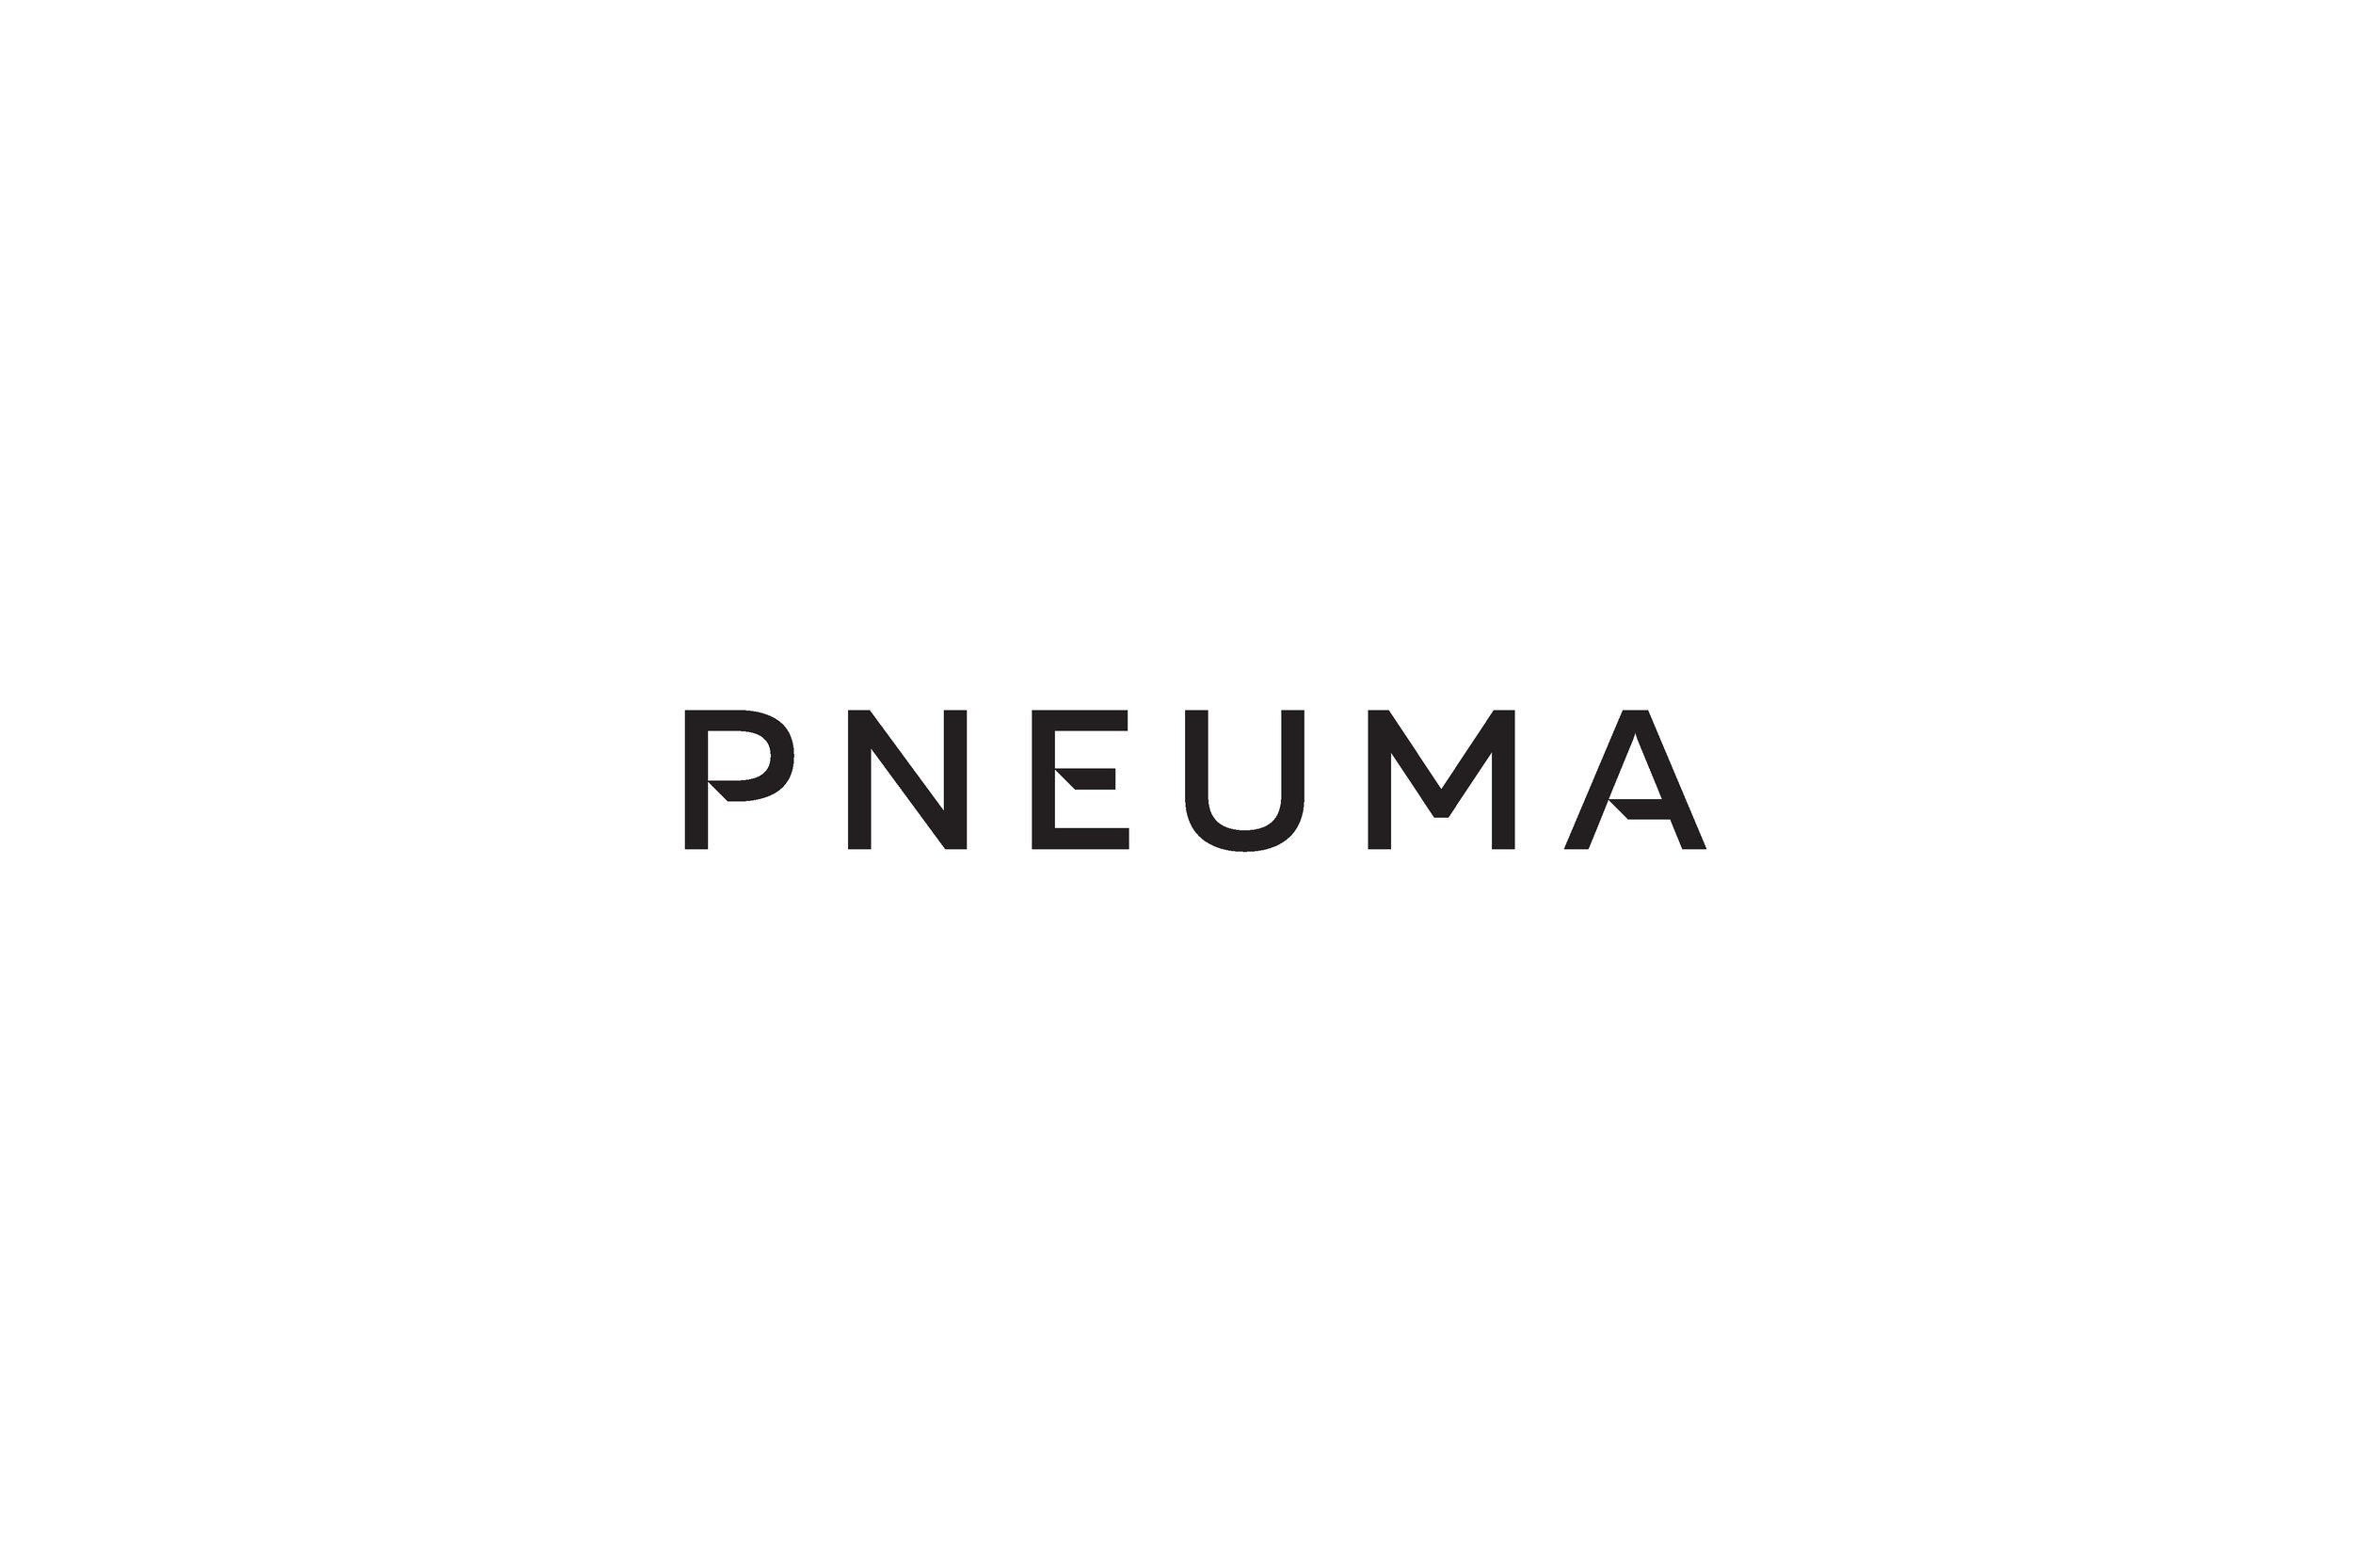 Pneuma2.jpg